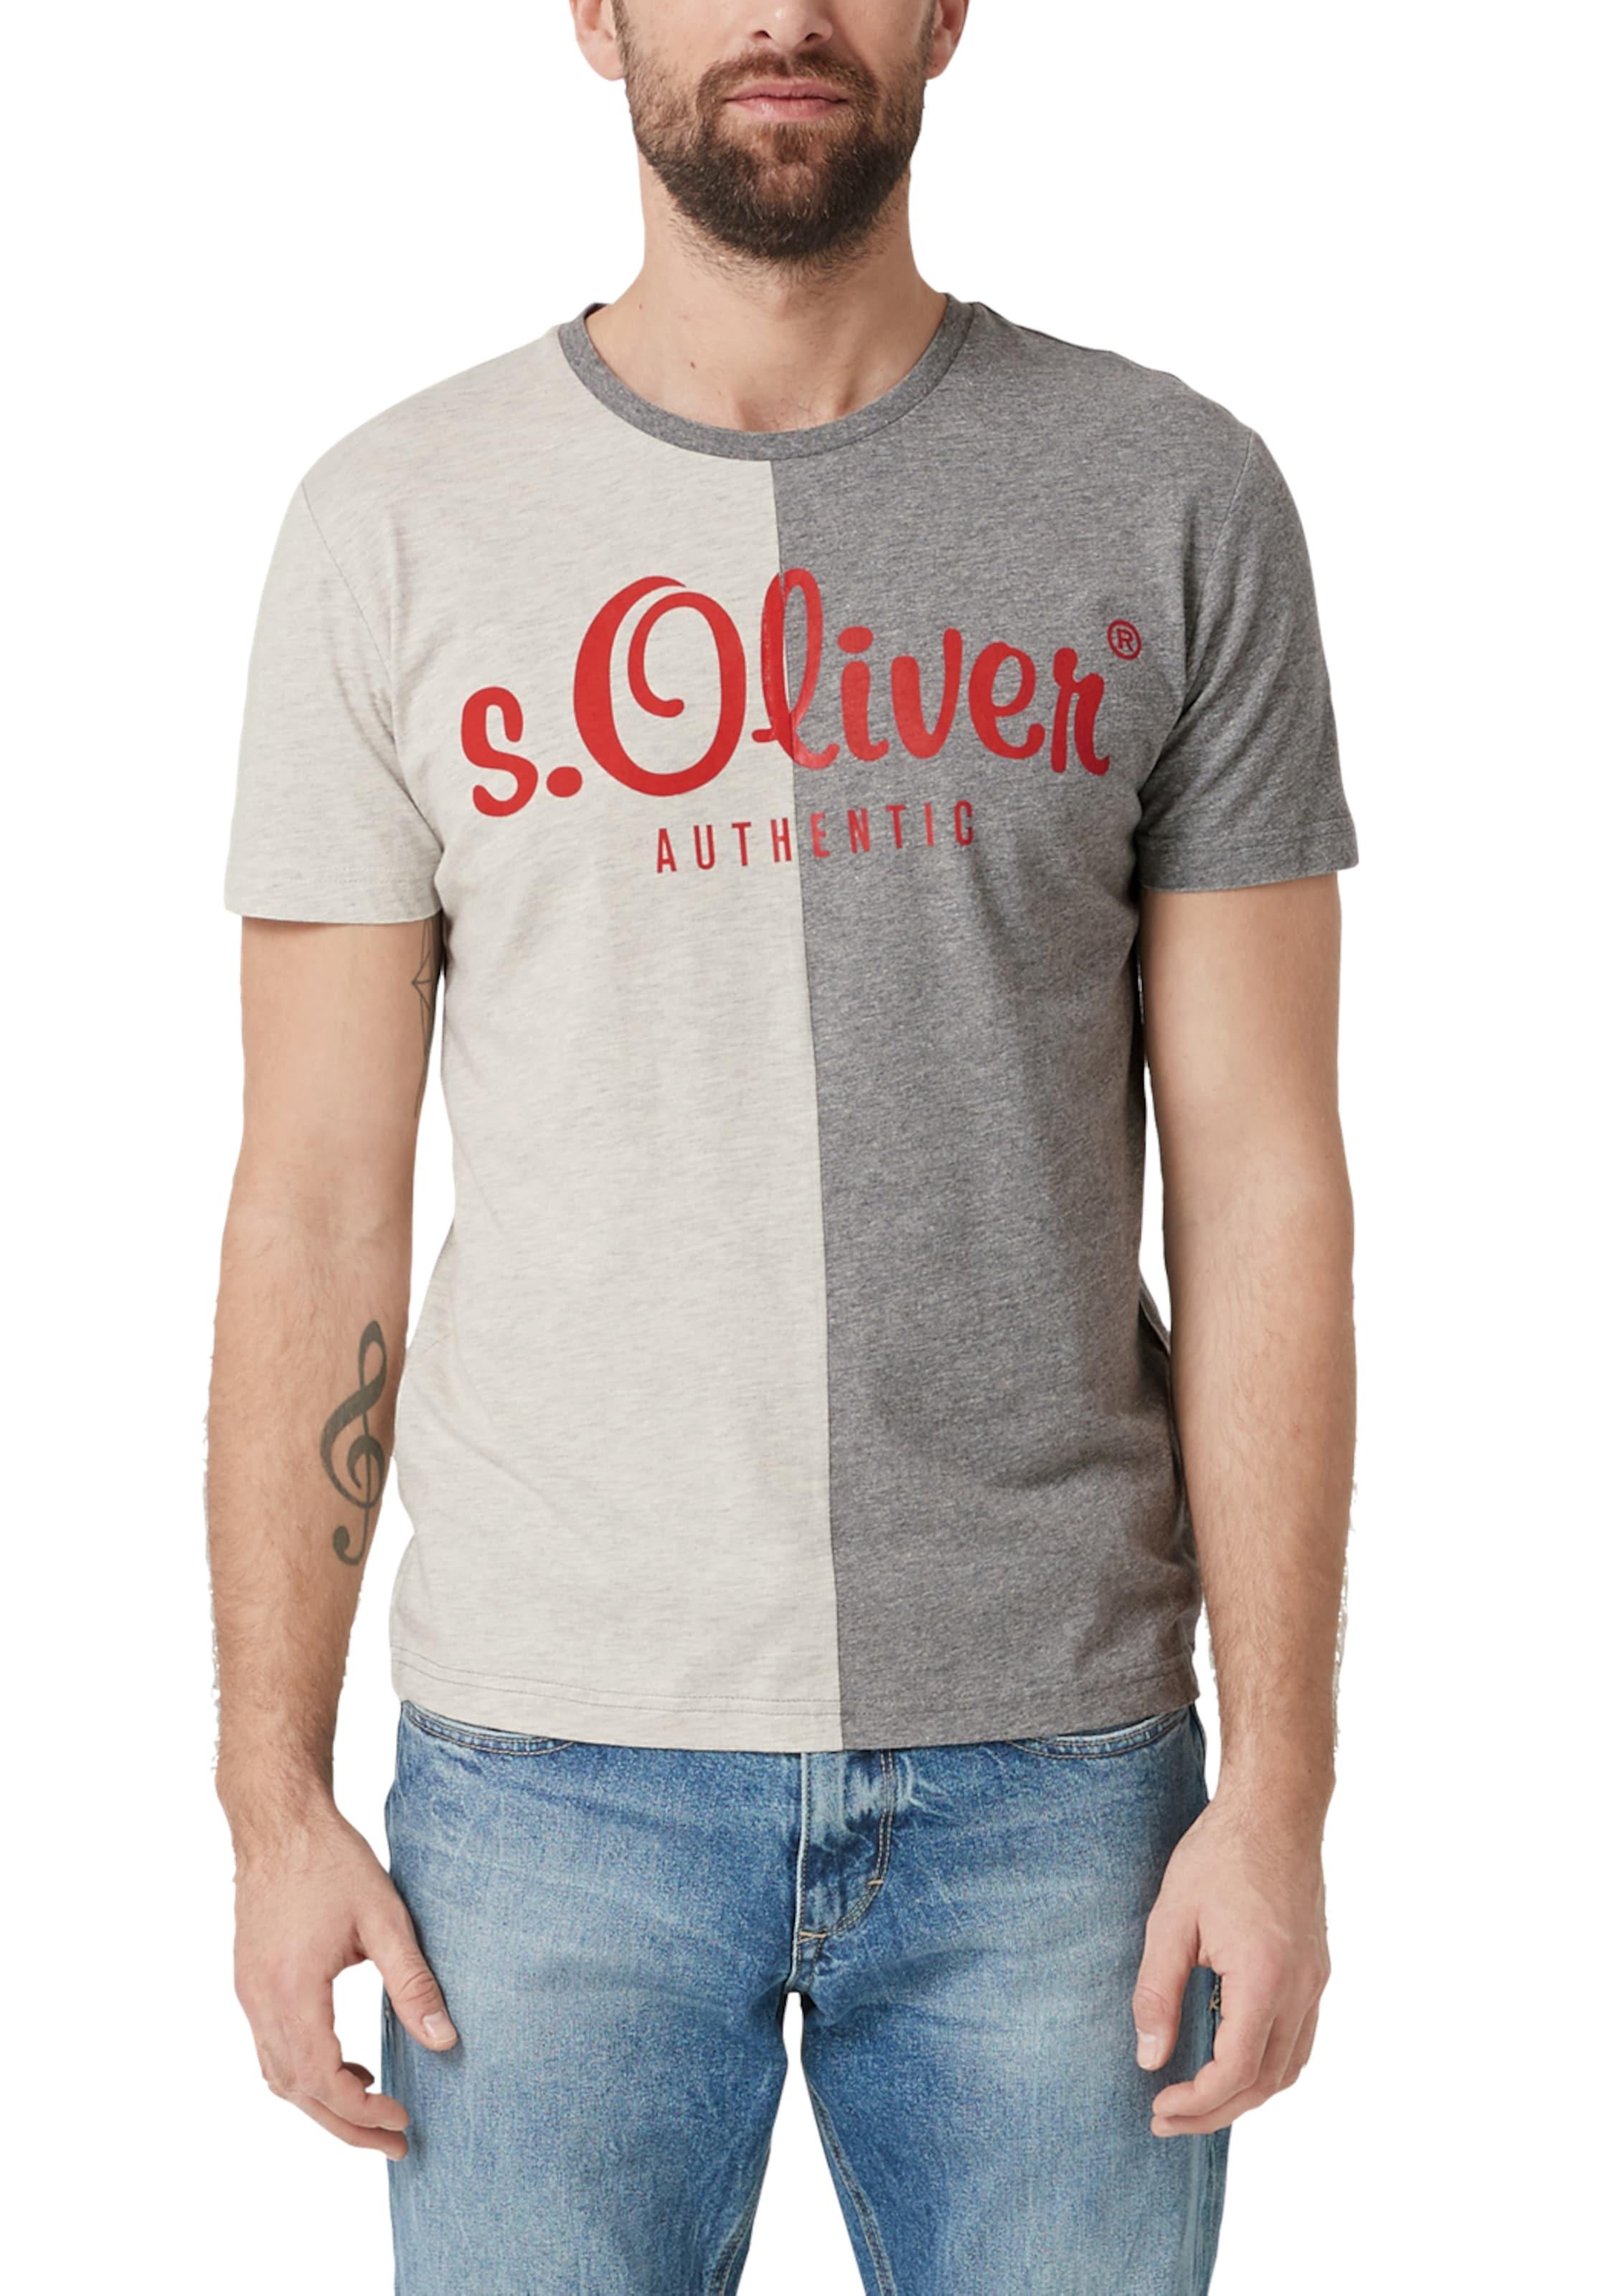 oliver shirt Rot S Red BeigeGrau T In Label SMVqUGLpjz